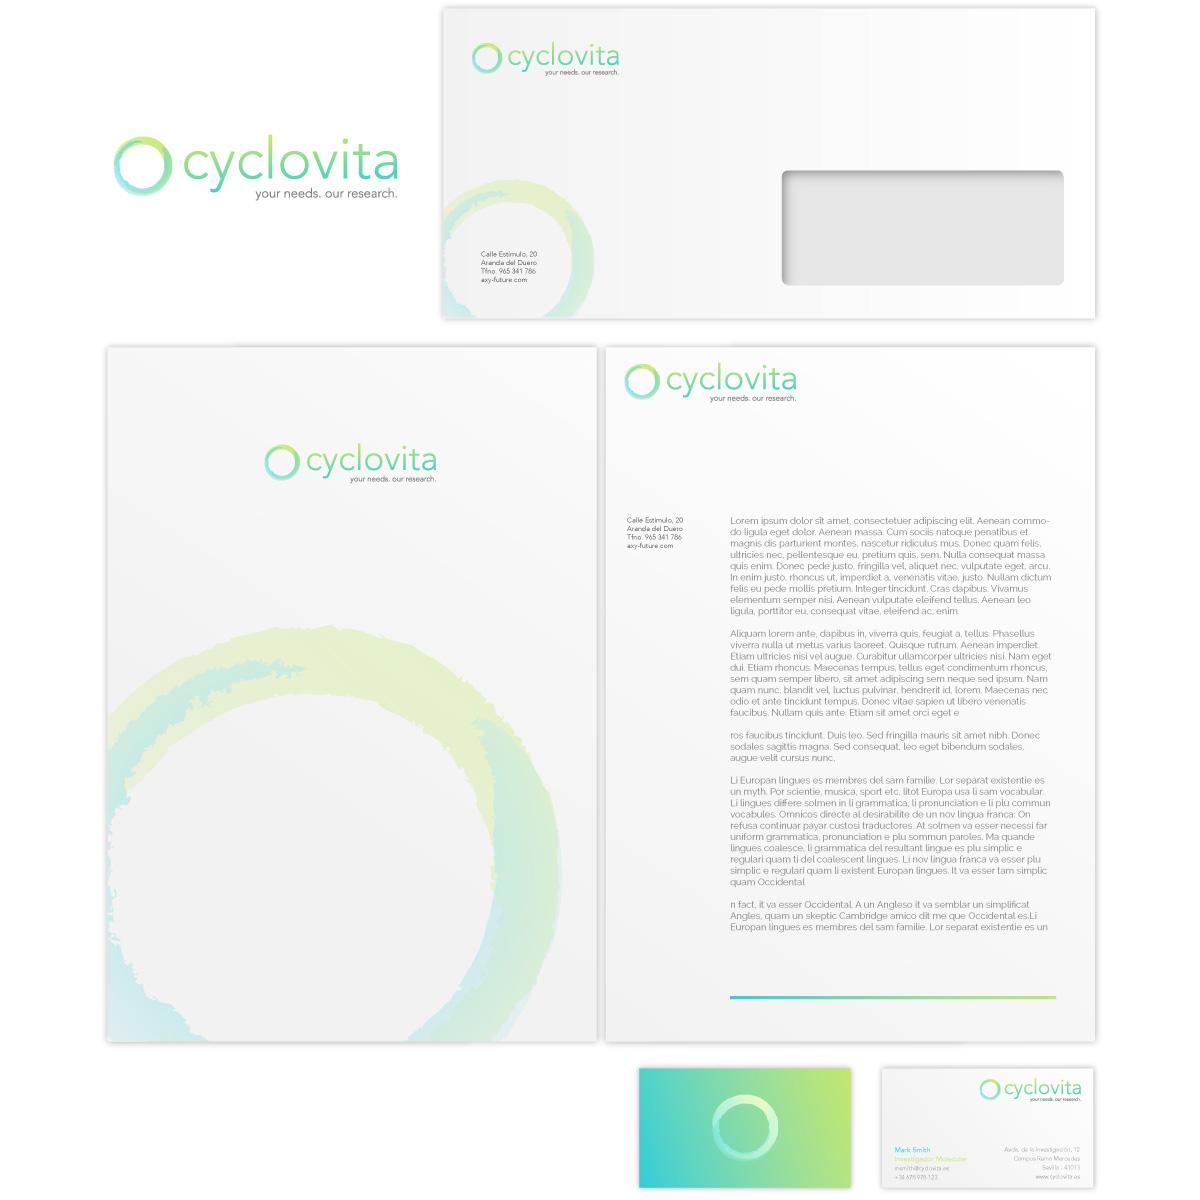 cyclovita